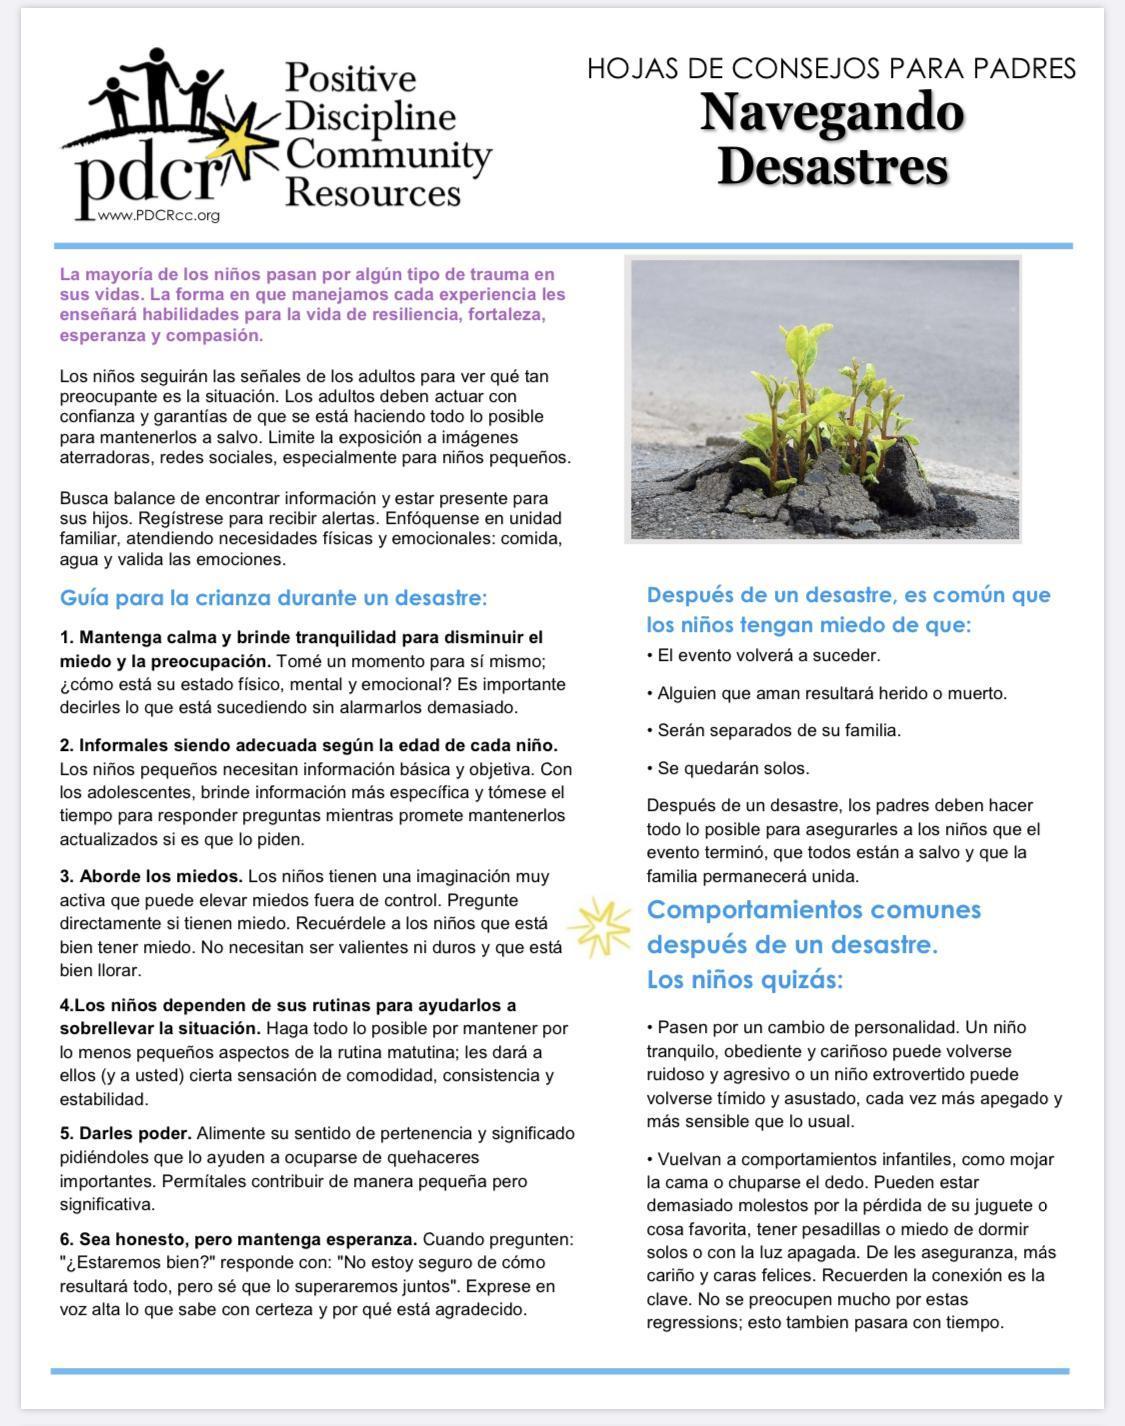 Navigating Disasters (Spanish)